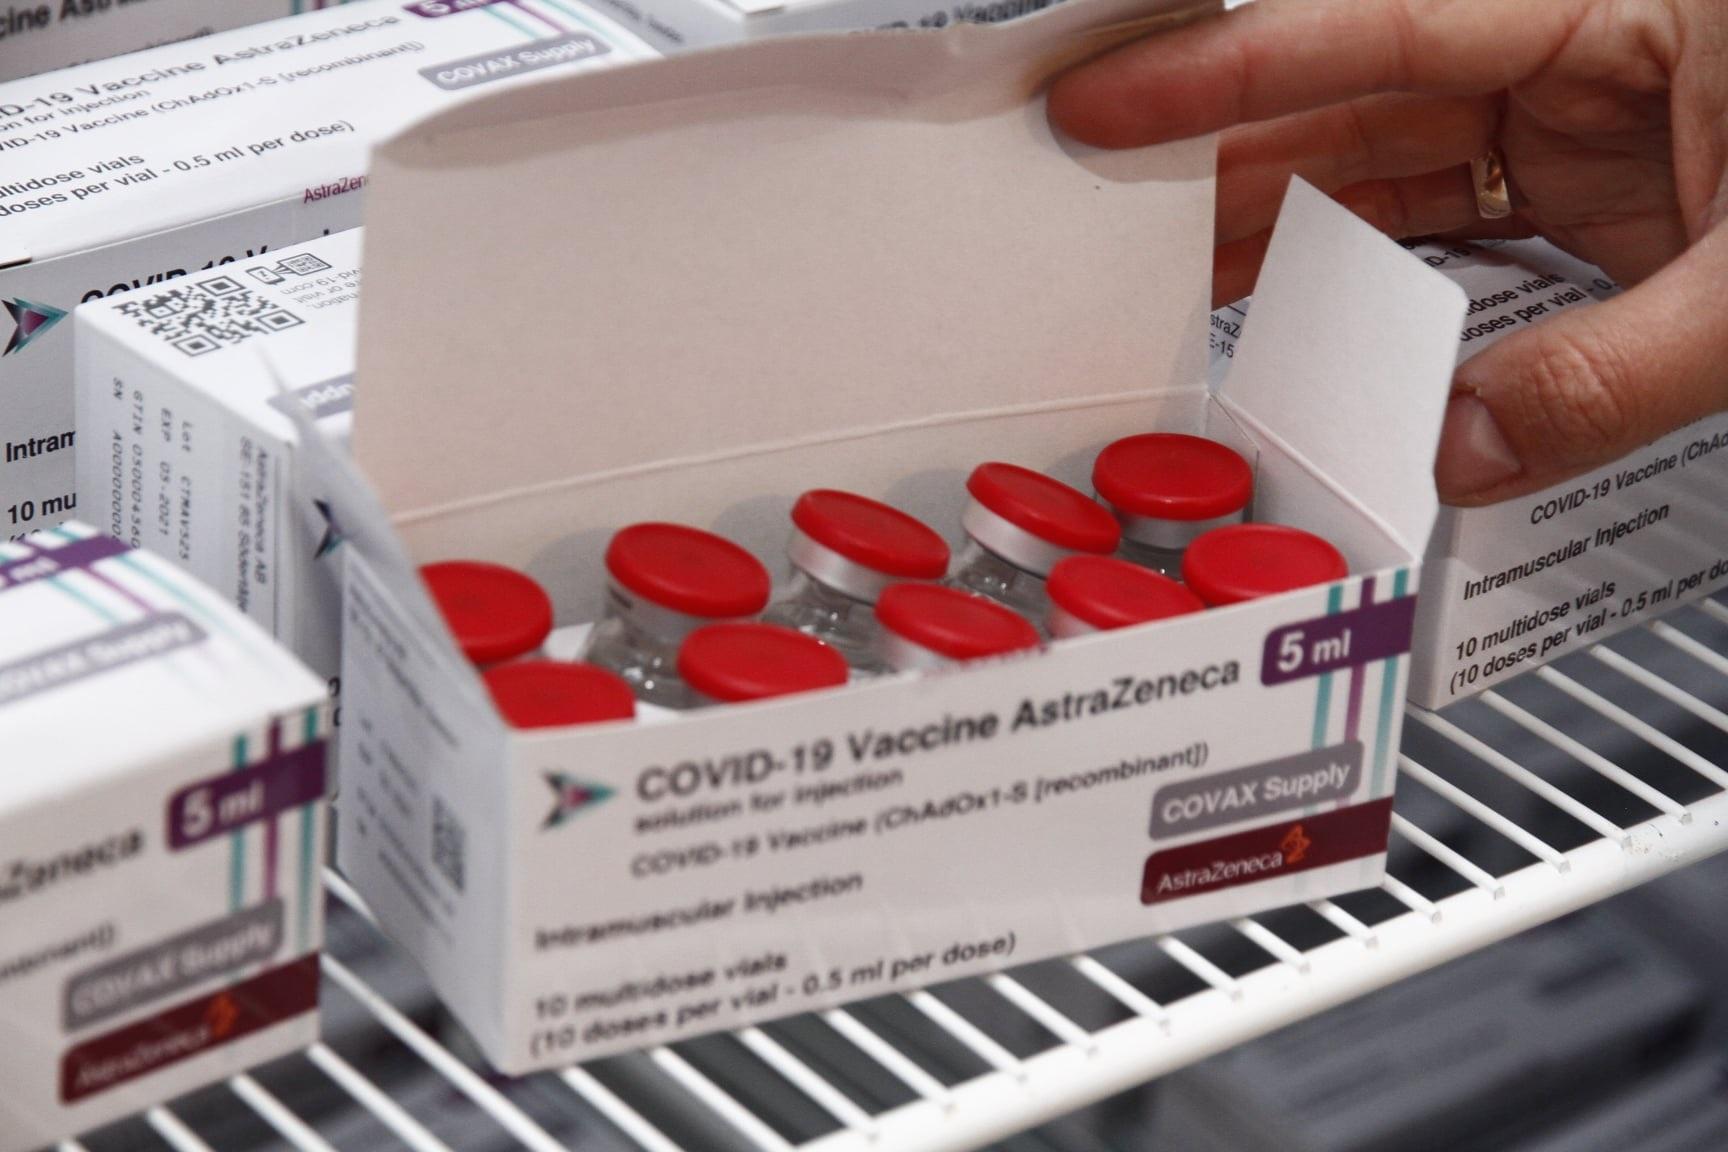 Полтавщина отримала ще одну партію вакцин AstraZeneca